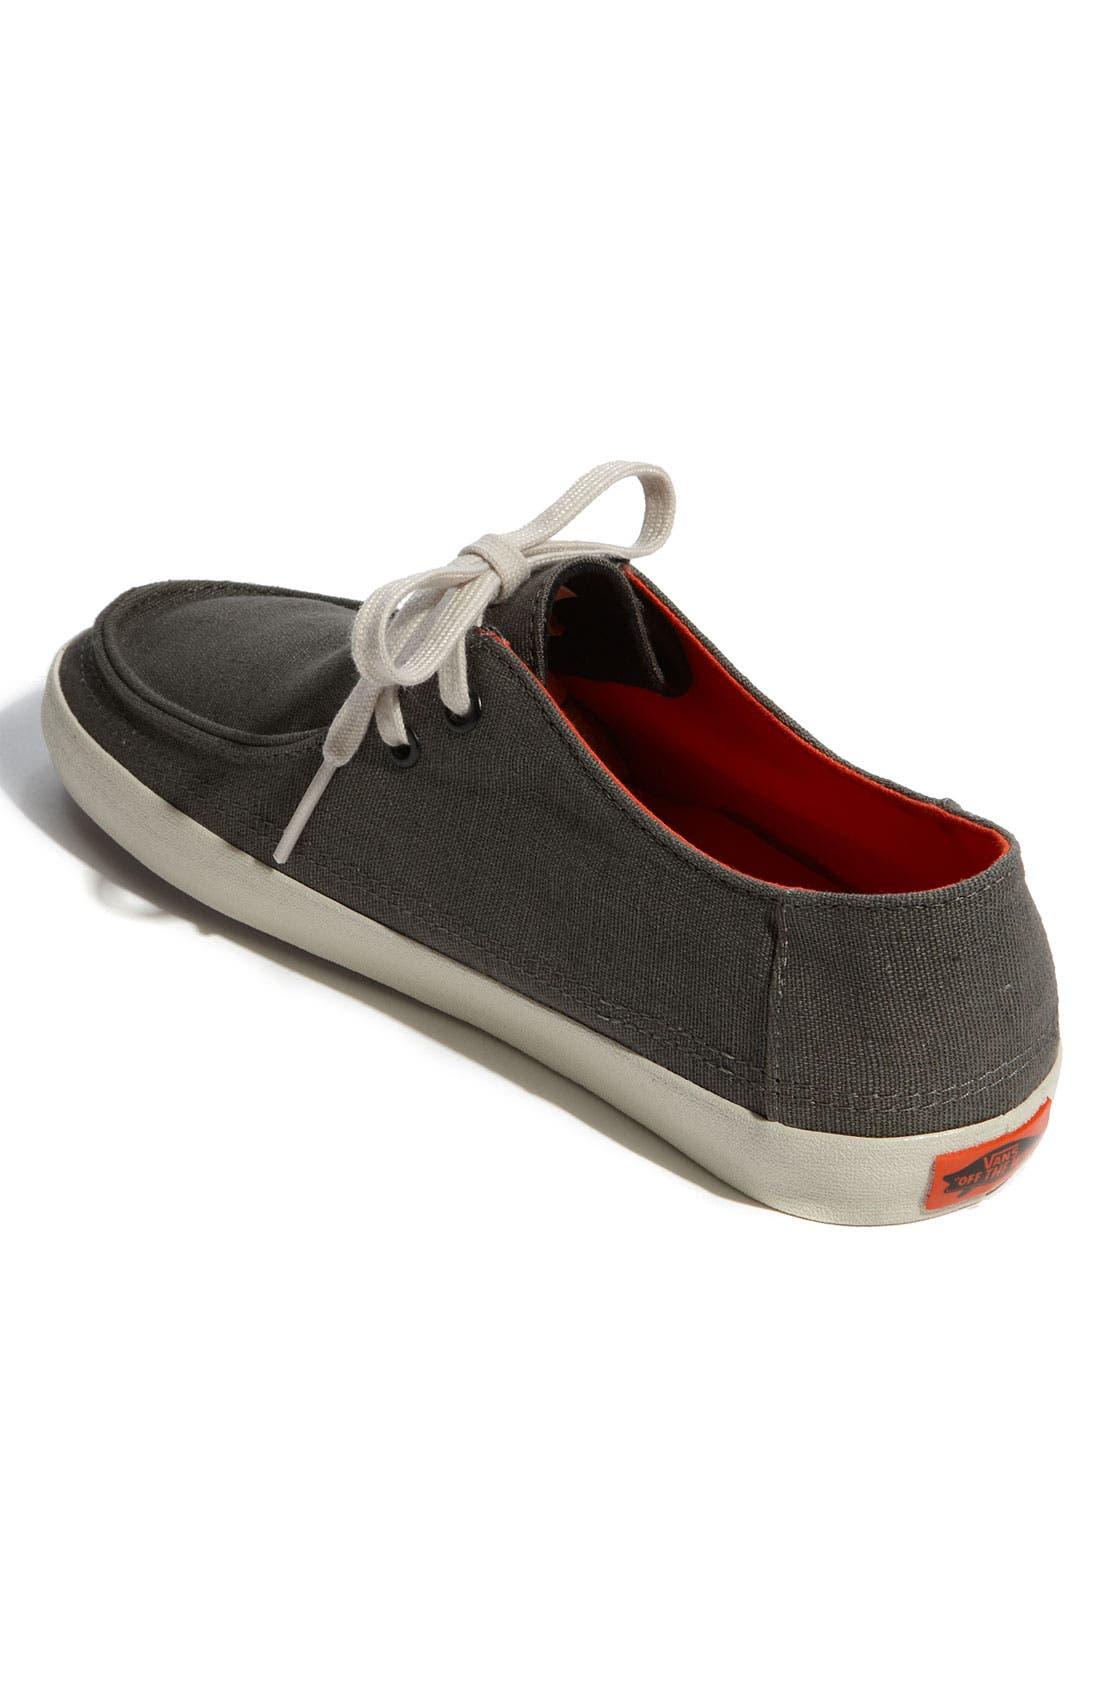 Alternate Image 2  - Vans 'Rata Vulc' Sneaker